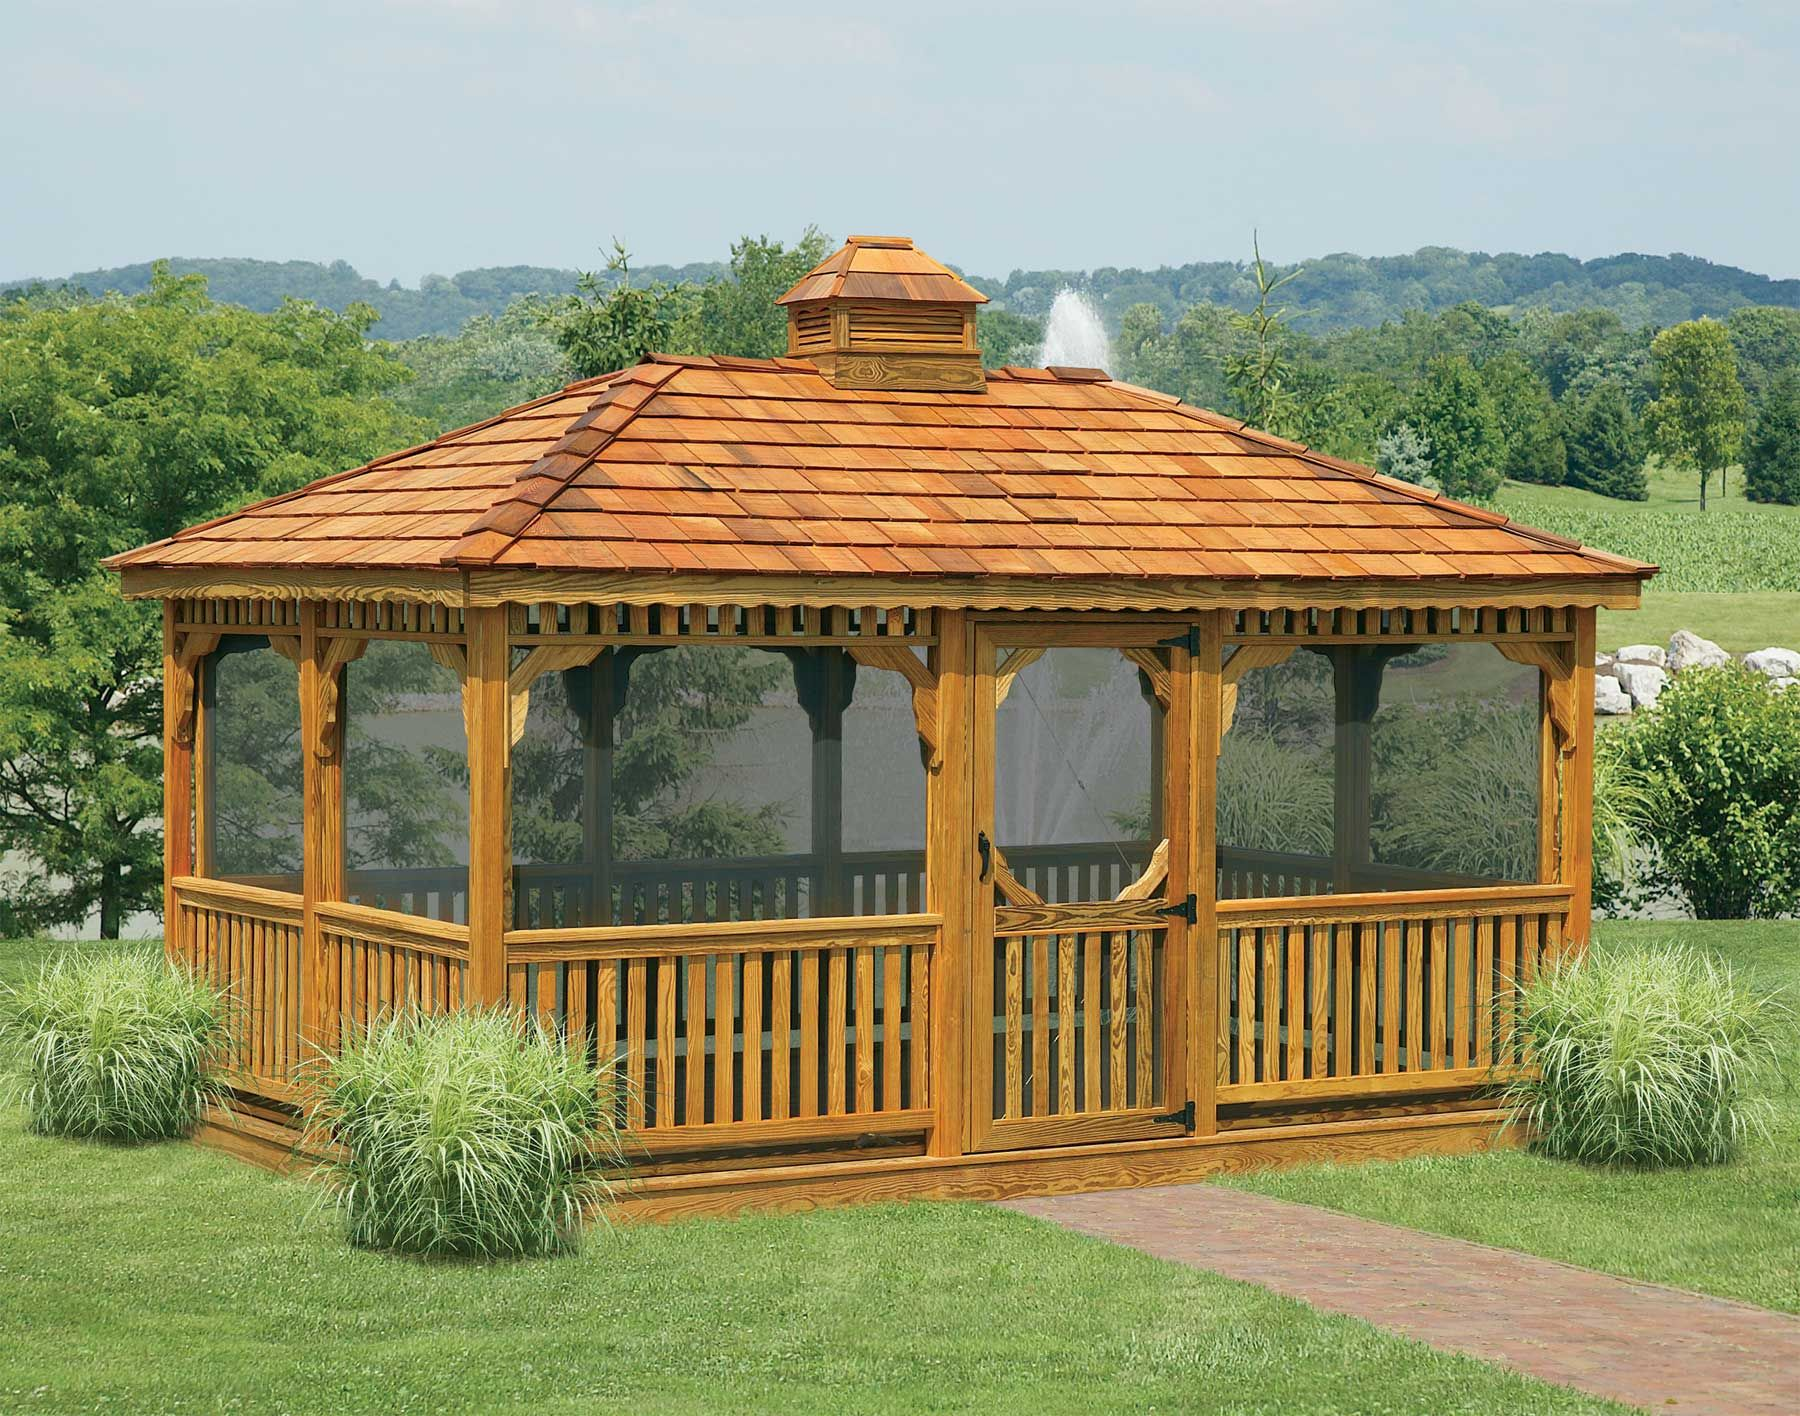 Exterior Exterior In Vogue Single Roof Rectangle Enclosed Gazebo Wooden Fencing As Decorate Outdoor Gardening Alluring Enclosed Awesome Concept Design ... & cum construiesti un foisor dreptunghiular | Utile | Pinterest ...